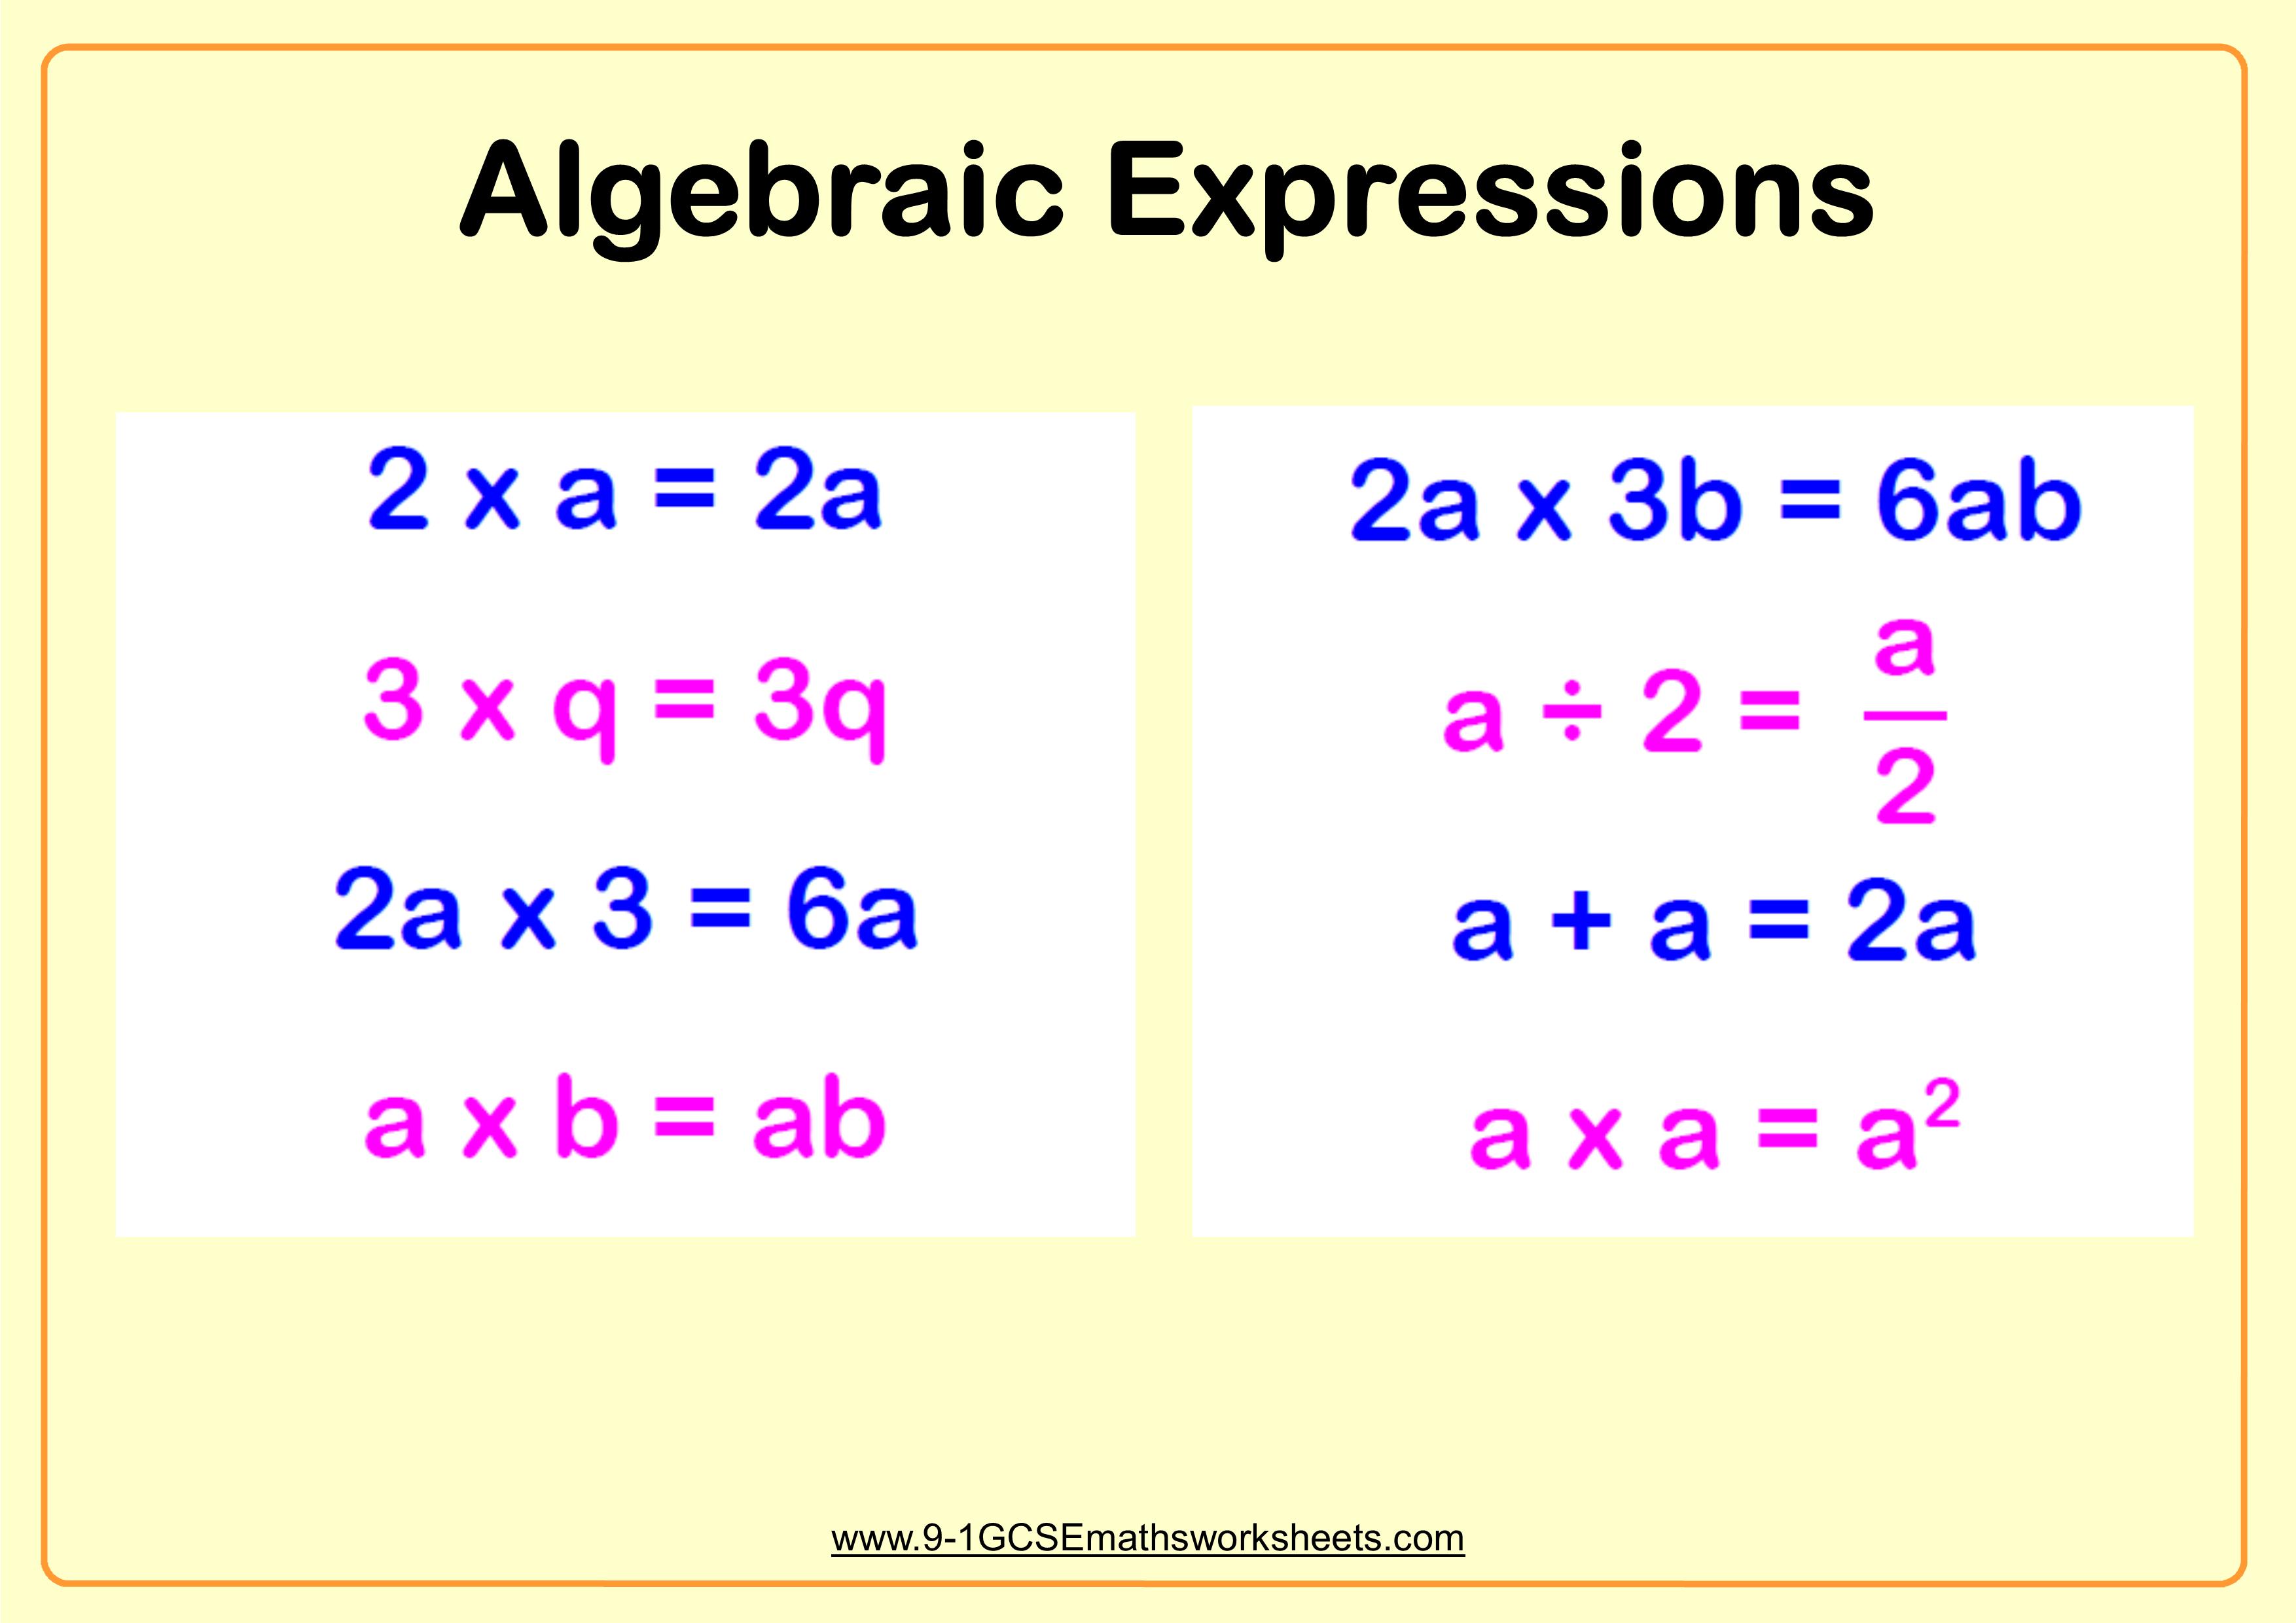 Simplifying Algebraic Expressions Example Gcse Maths Worksheets